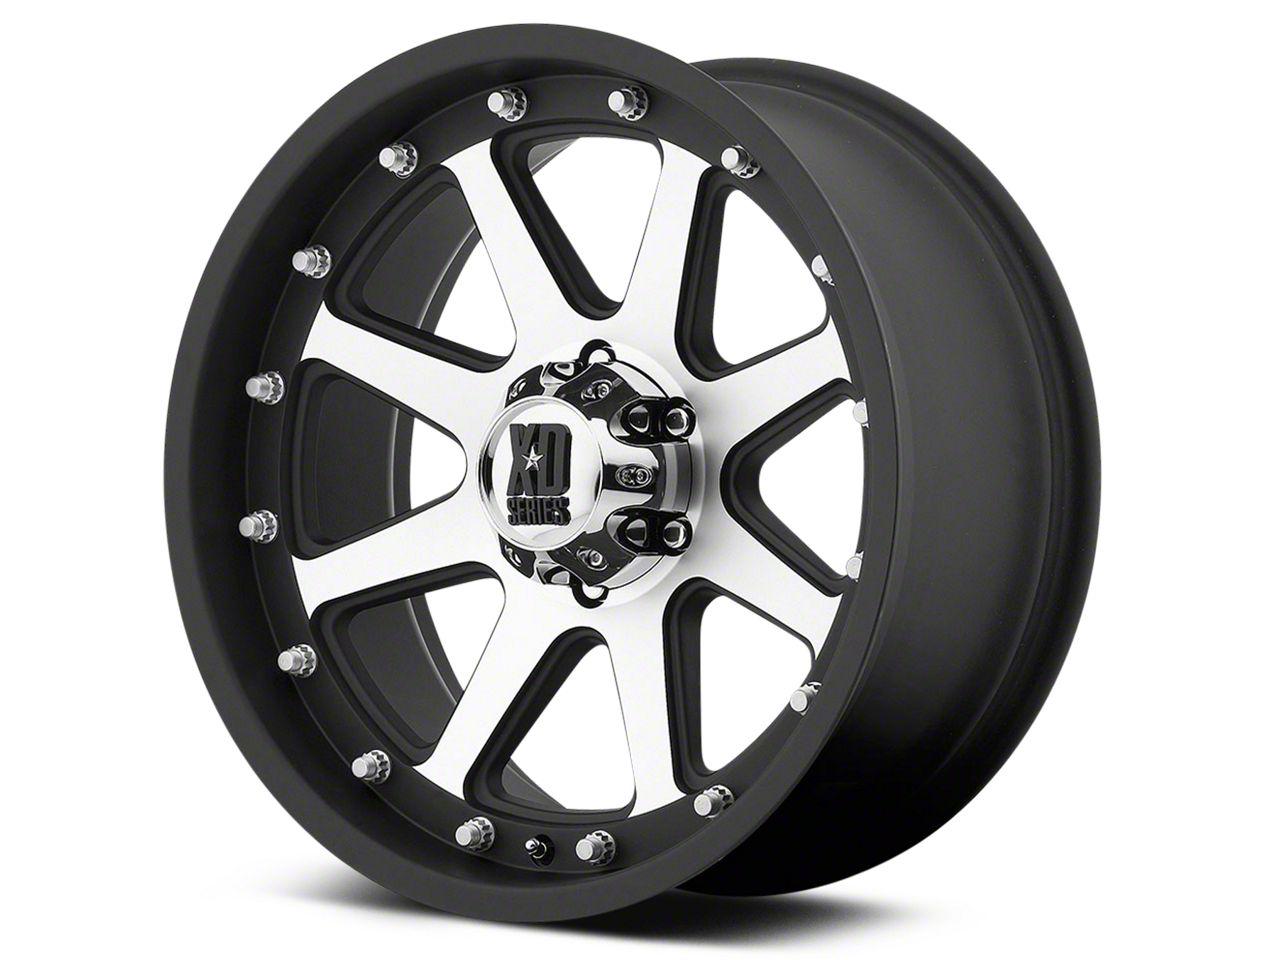 XD Addict Matte Black Machined 6-Lug Wheel - 18x9 (99-19 Silverado 1500)